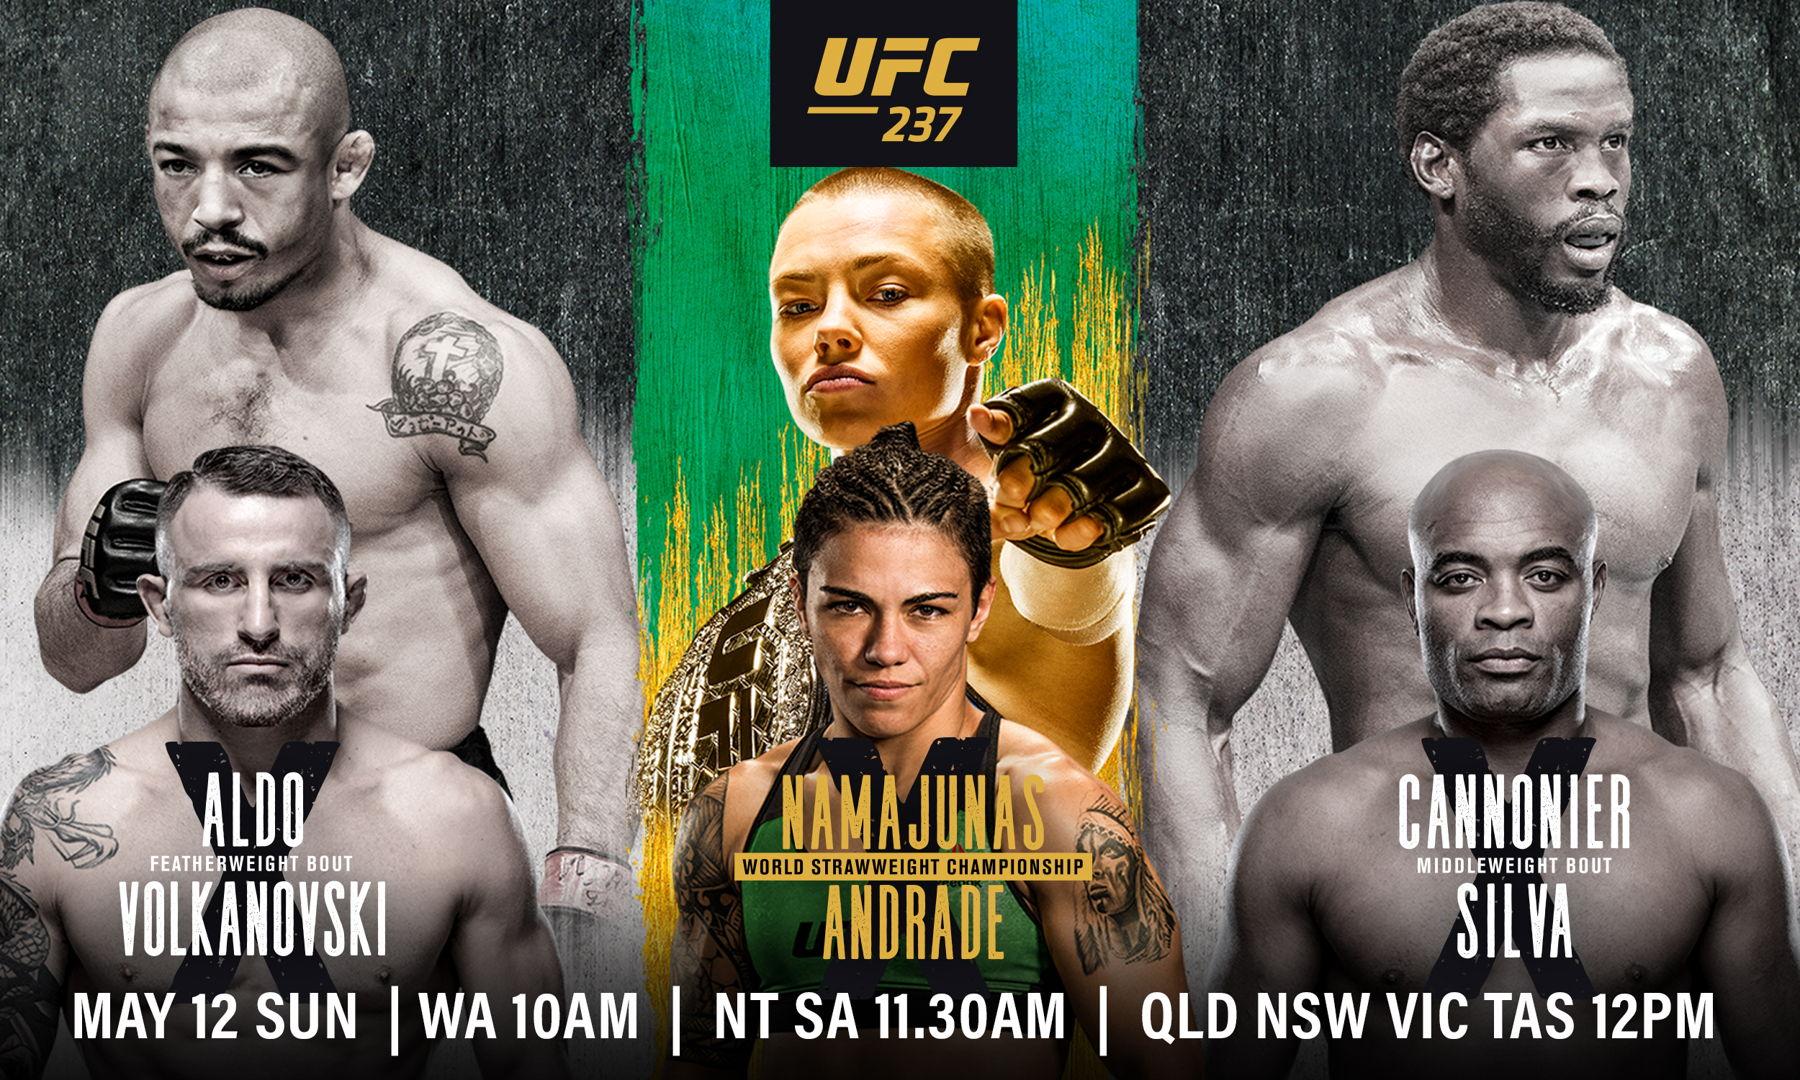 UFC_237_banner_better_at_the_pub.jpg